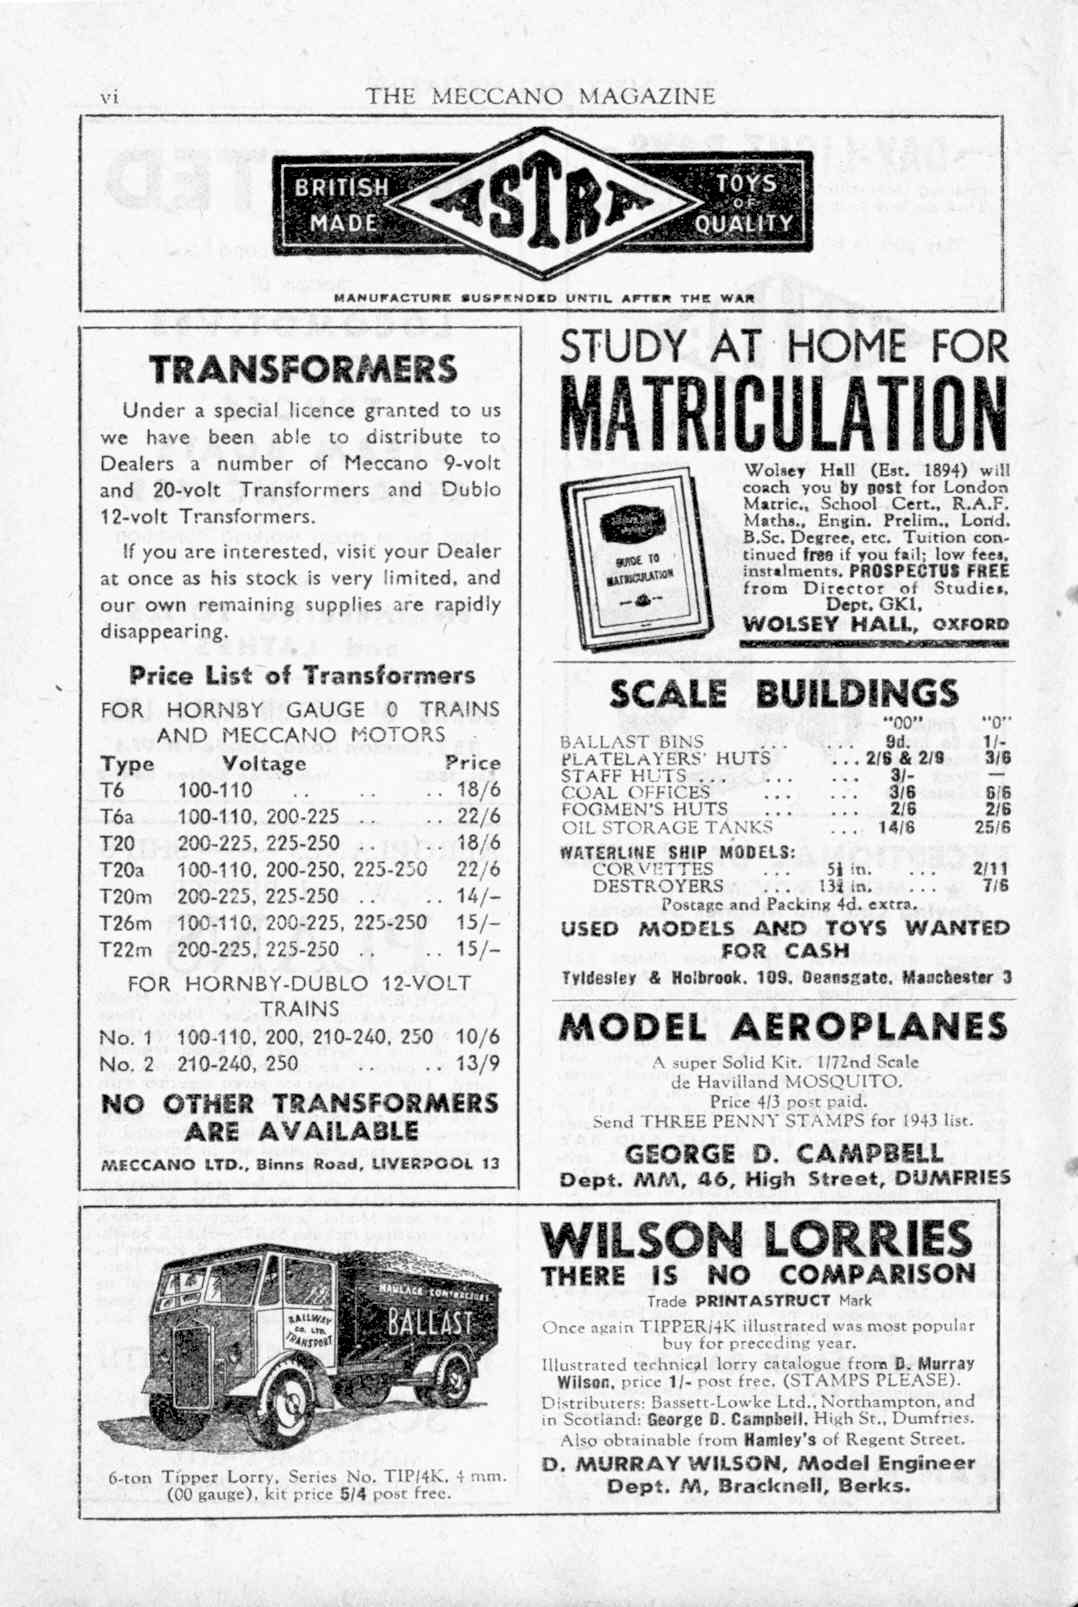 UK Meccano Magazine May 1943 Page vi